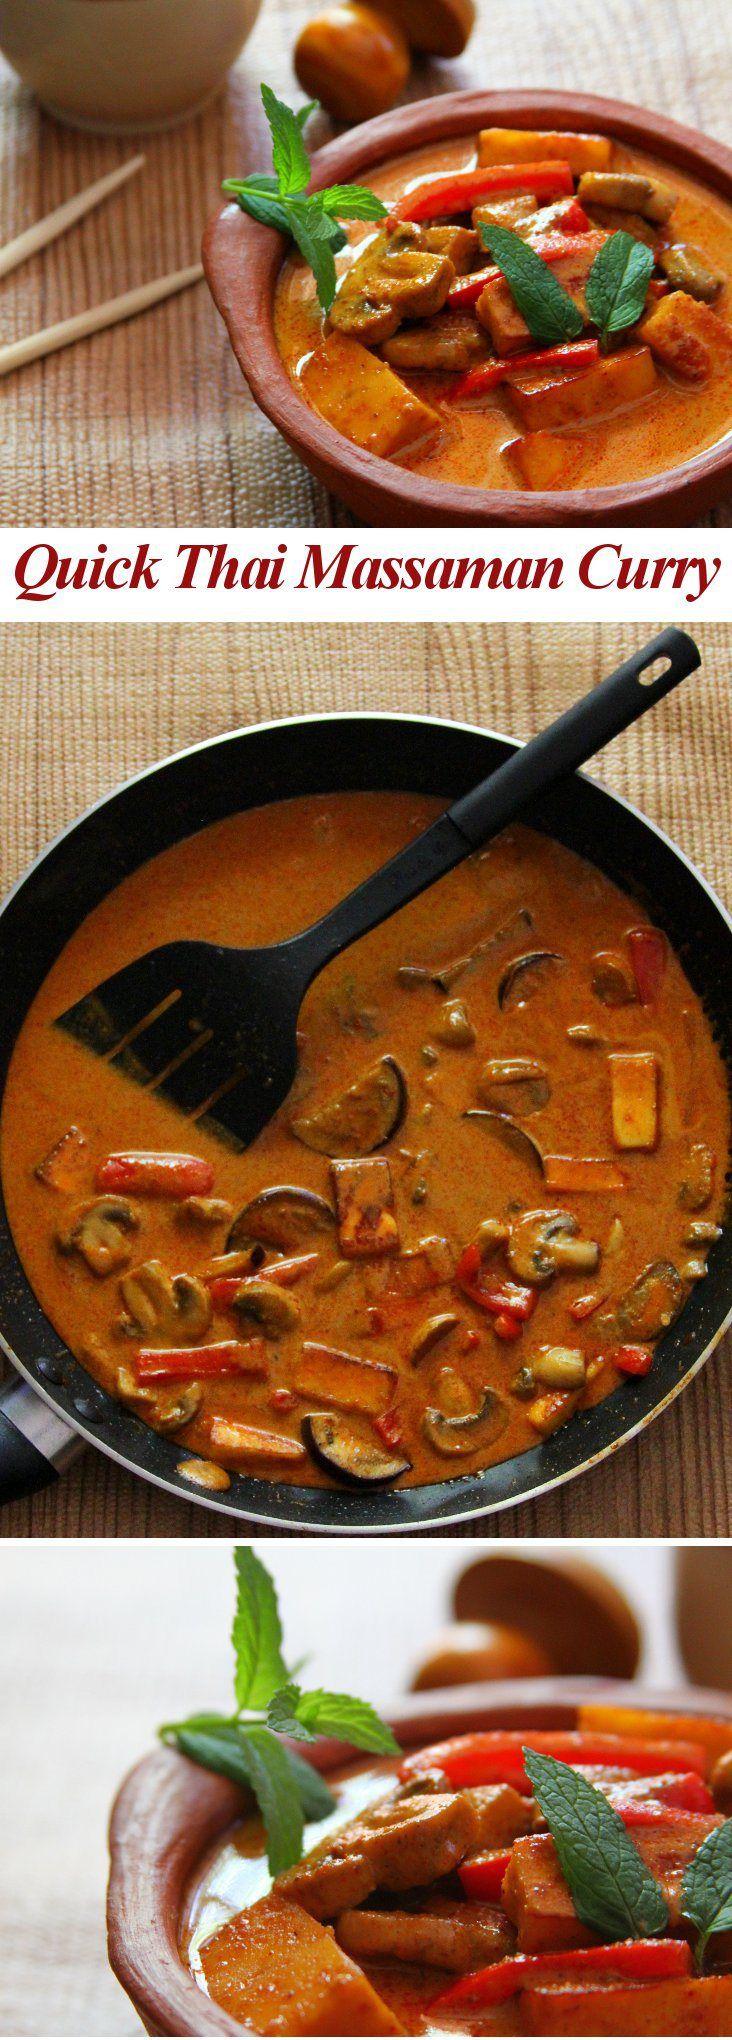 Quick Thai Massaman Curry Bleh.. Eggplant..